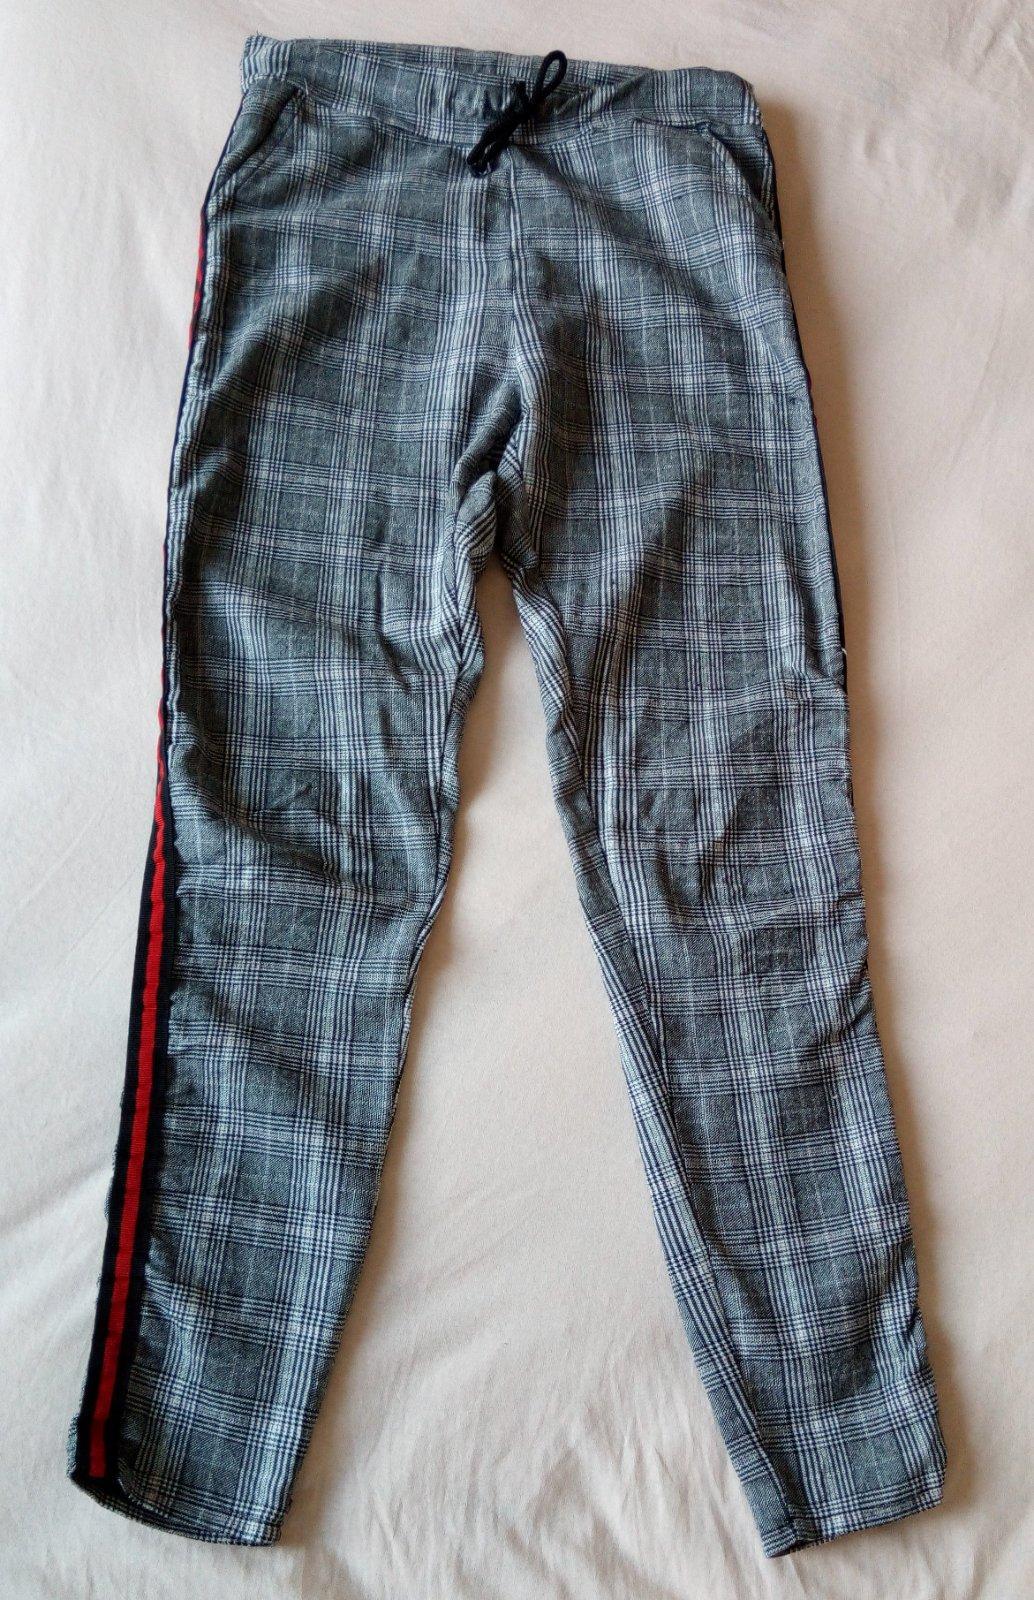 Kárované nohavice S - Obrázok č. 4